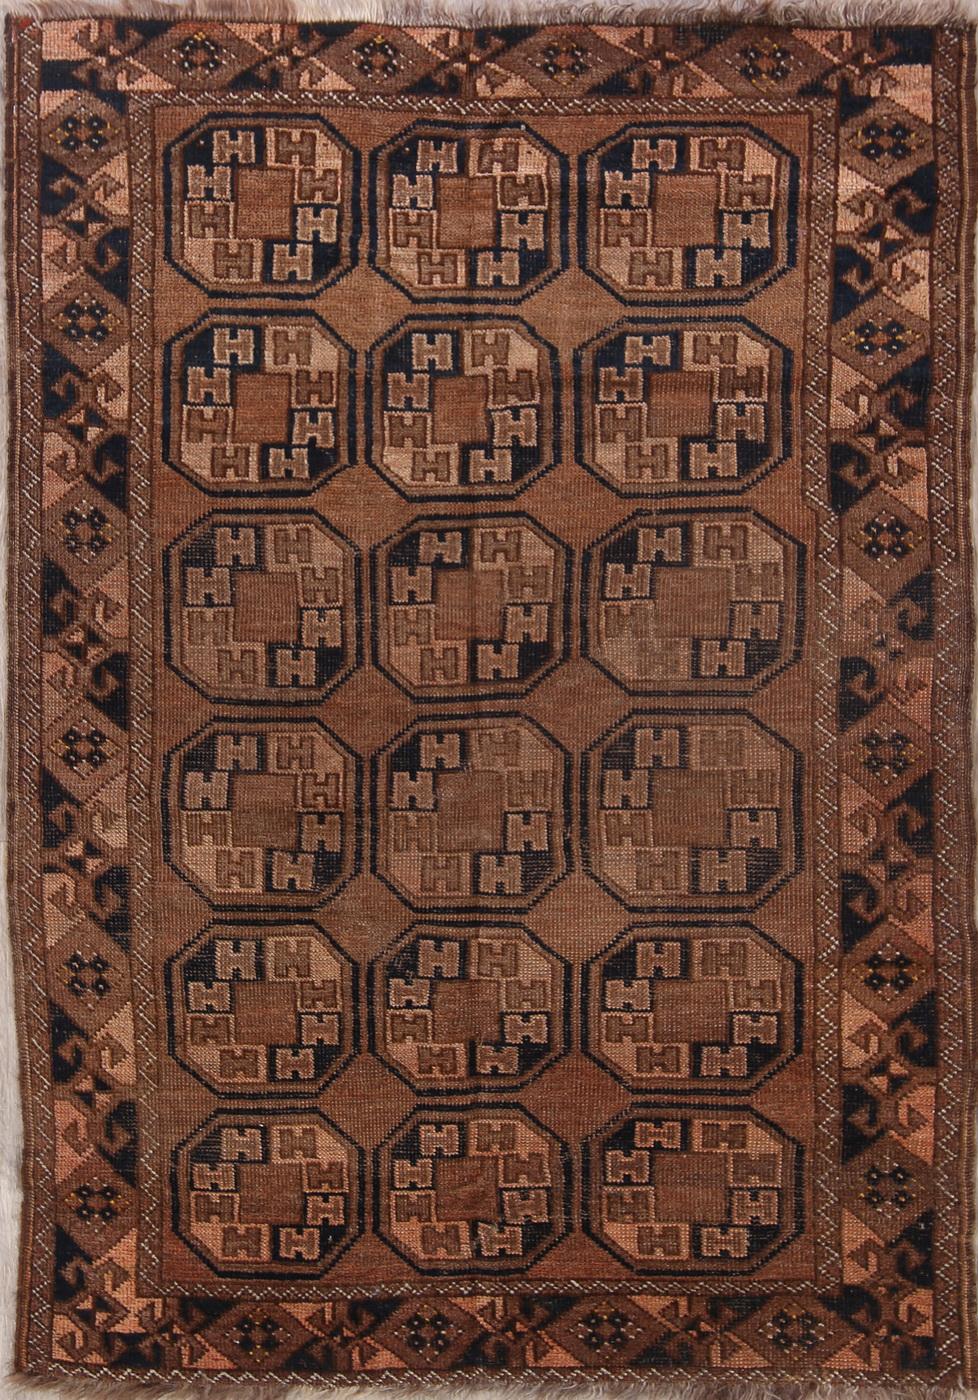 Antique Geometric Rust Brown Balouch Bokhara Afghan Hand